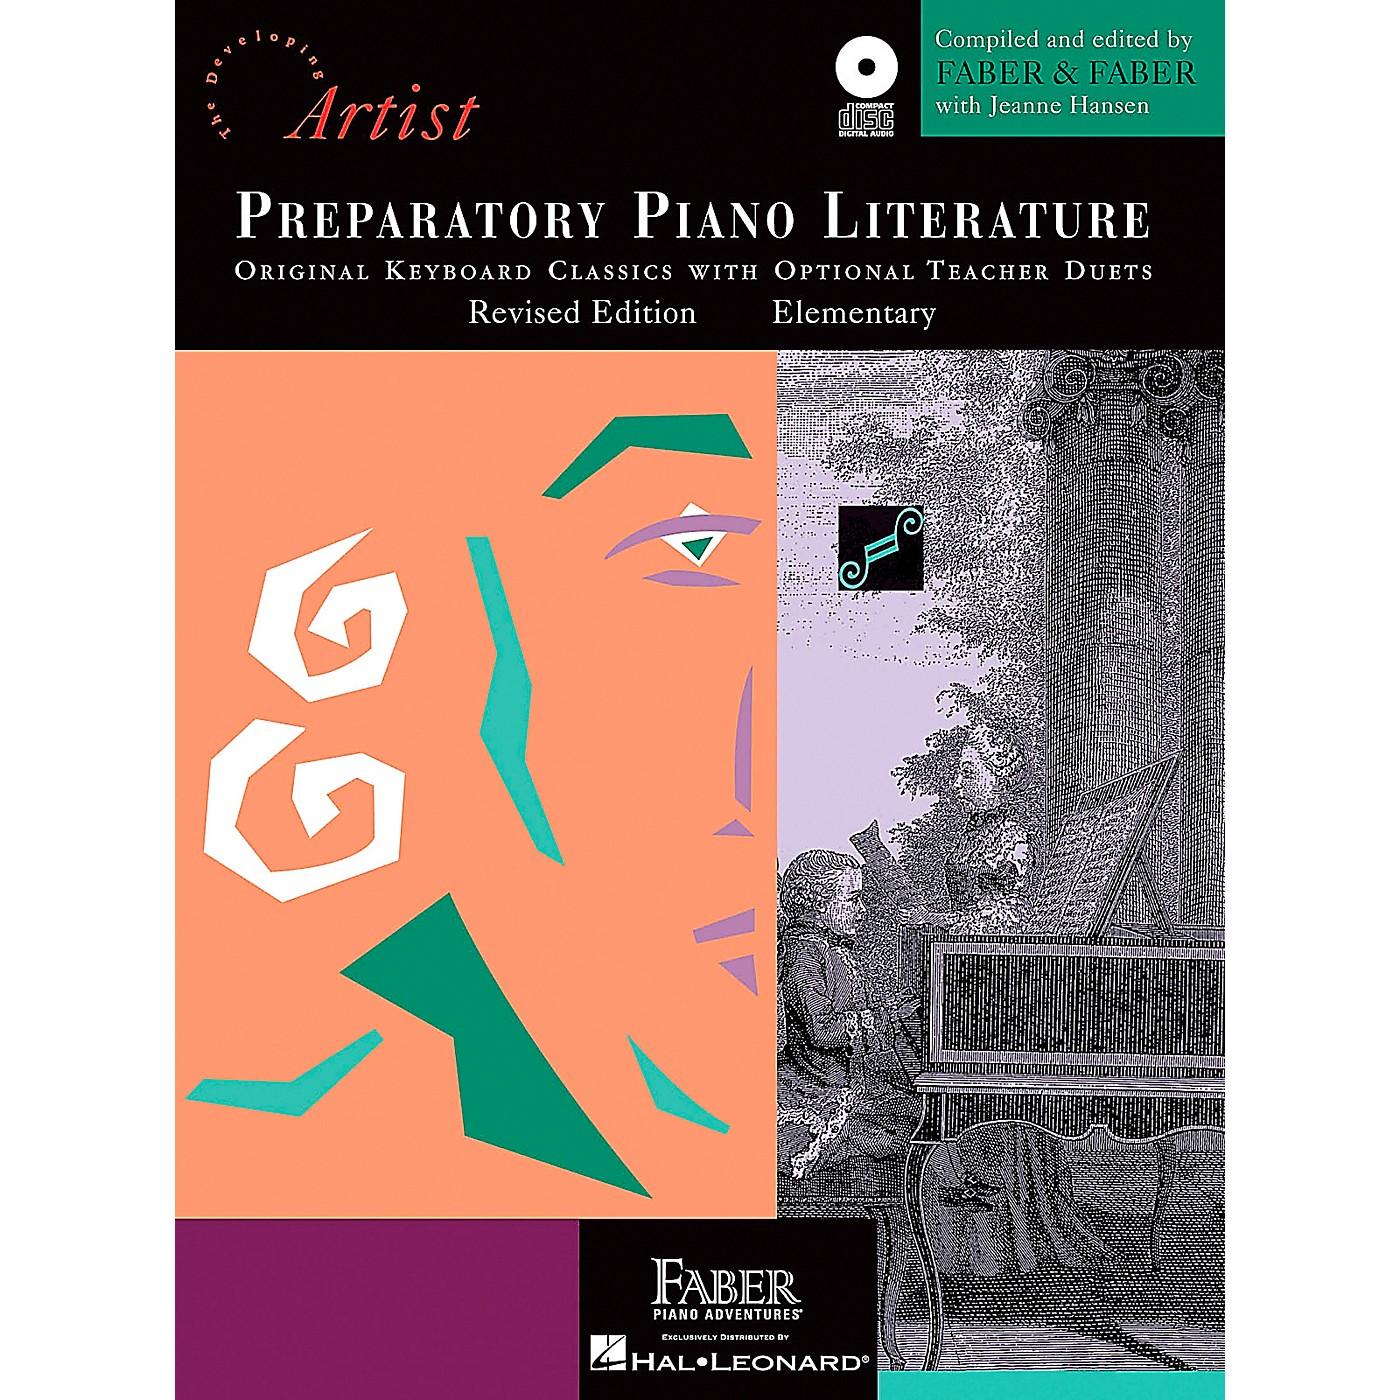 Faber Piano Adventures Preparatory Piano Literature - Developing Artist Original Keyboard Classics Book/CD Faber Piano thumbnail